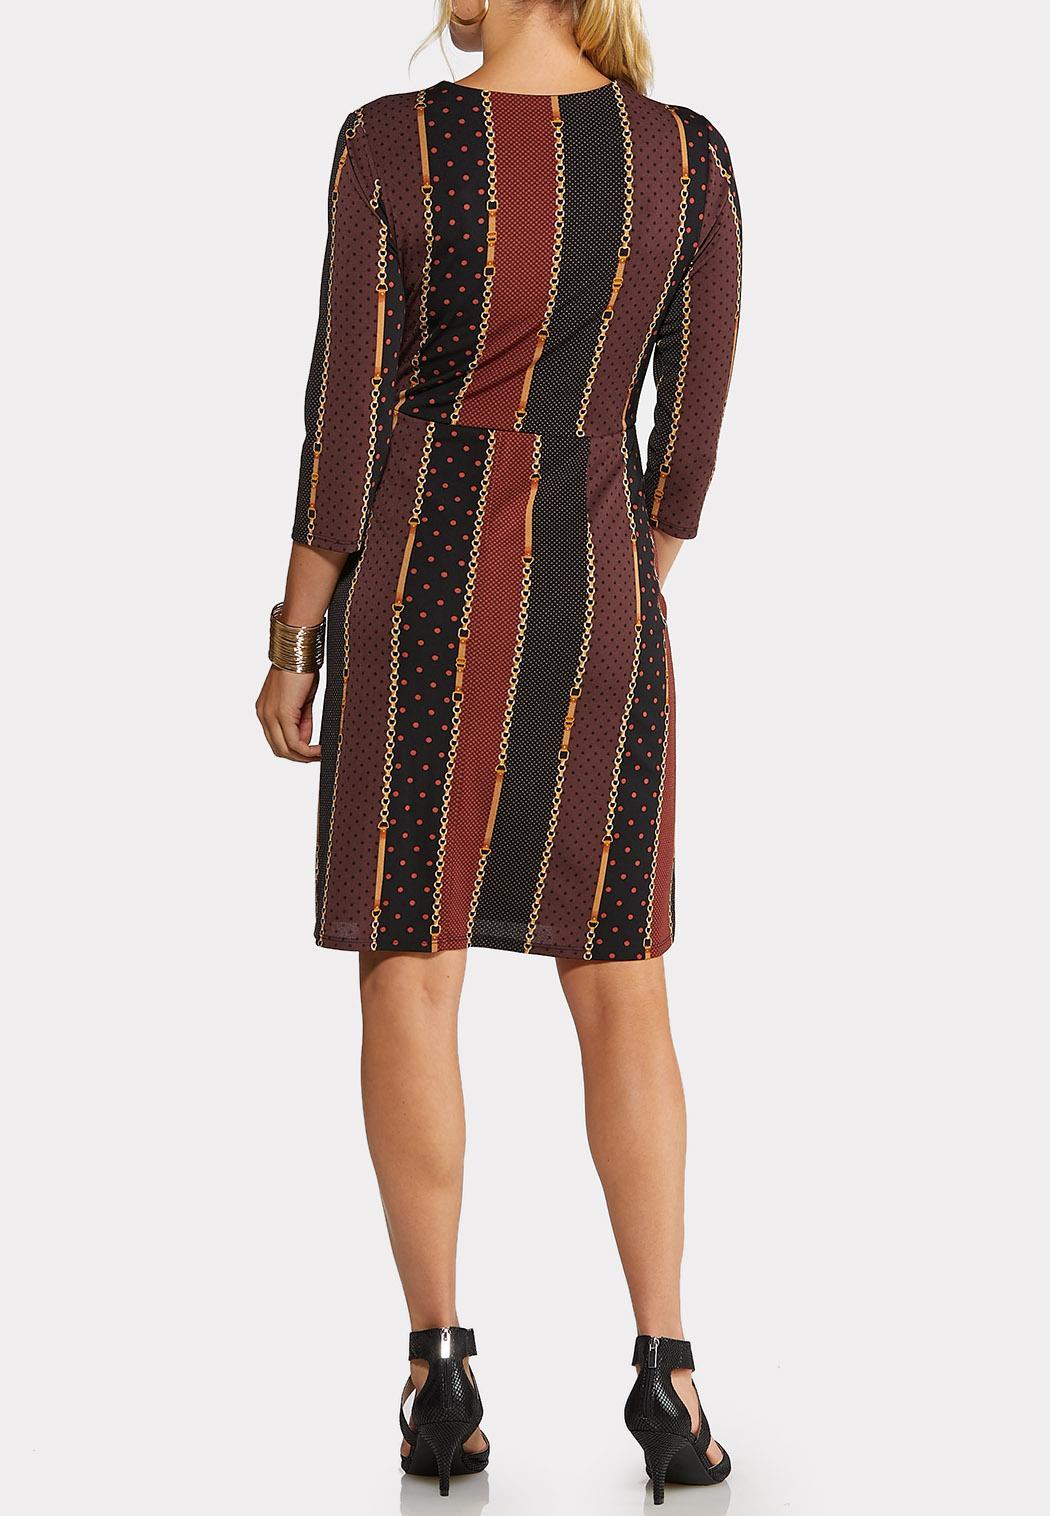 Plus Size Status Dot Wrap Dress (Item #43979728)